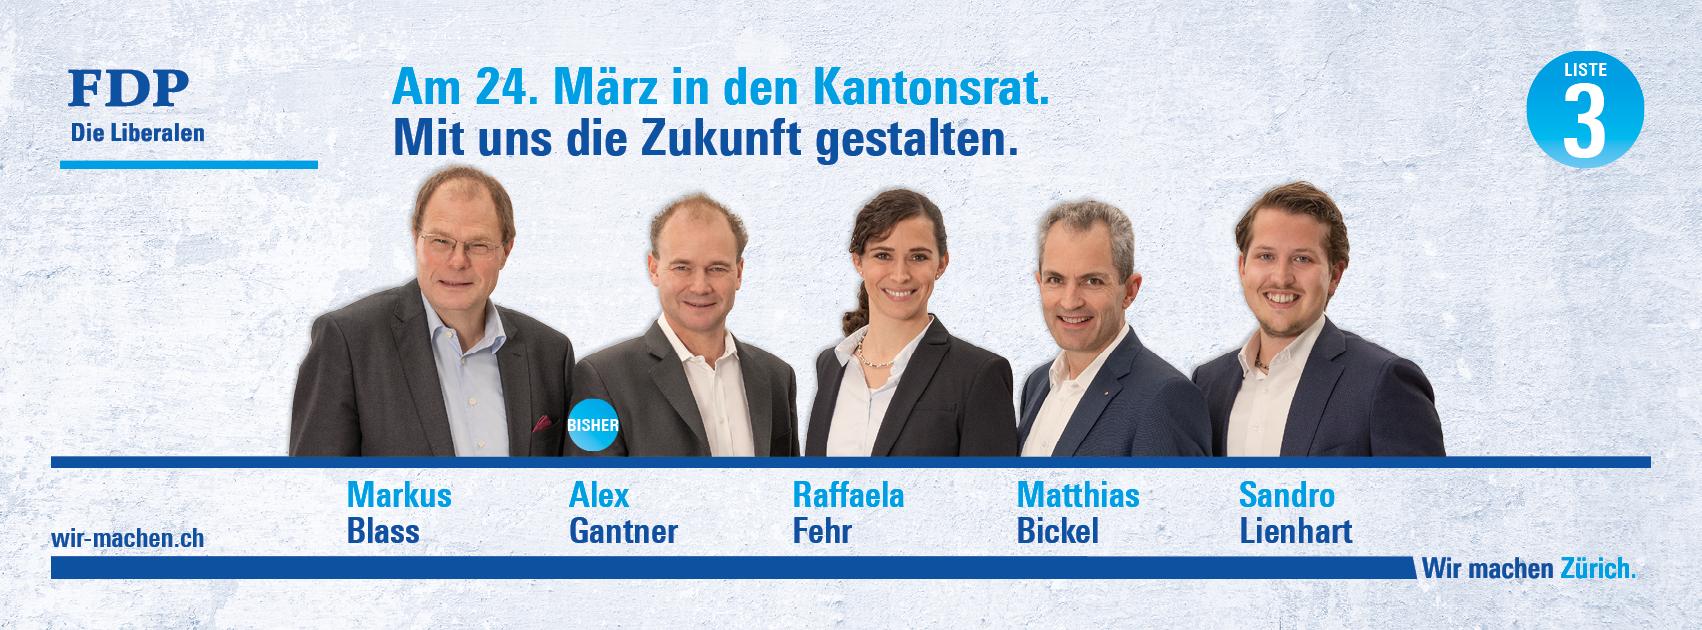 FDP_BezirkUster_KRW19_Header_Facebook